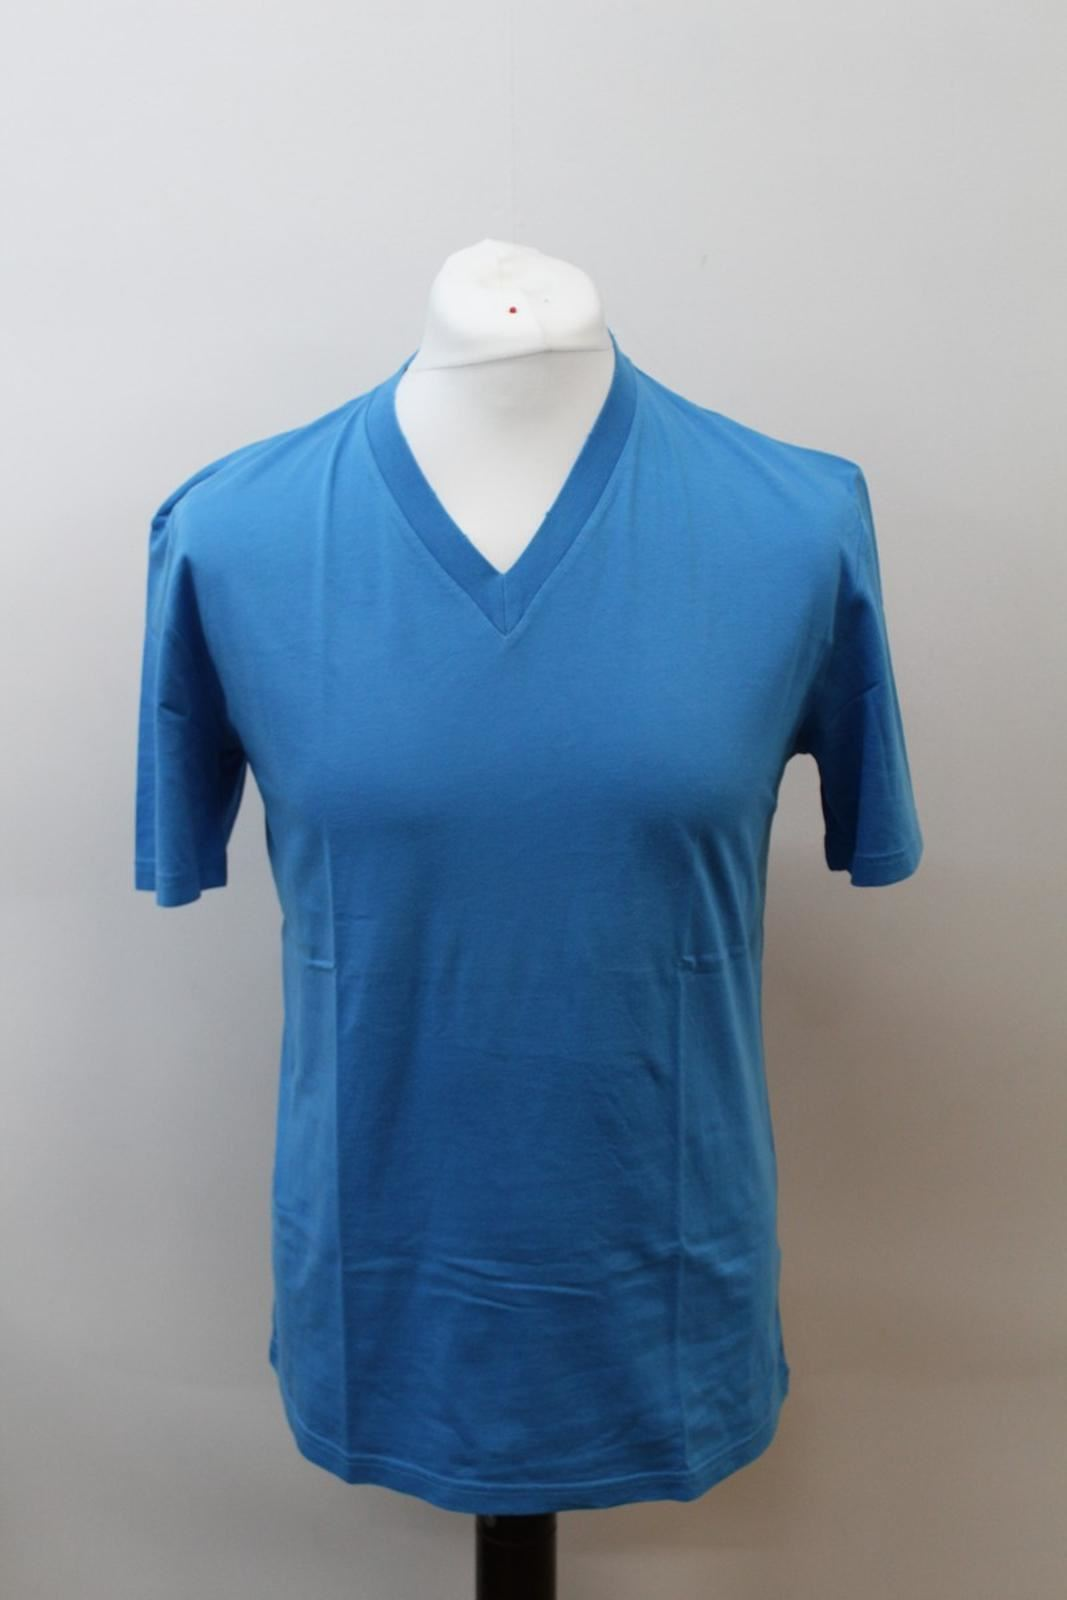 PRADA-Men-039-s-Deep-Blue-Cotton-Short-Sleeve-V-Neckline-Basic-T-Shirt-Size-XL